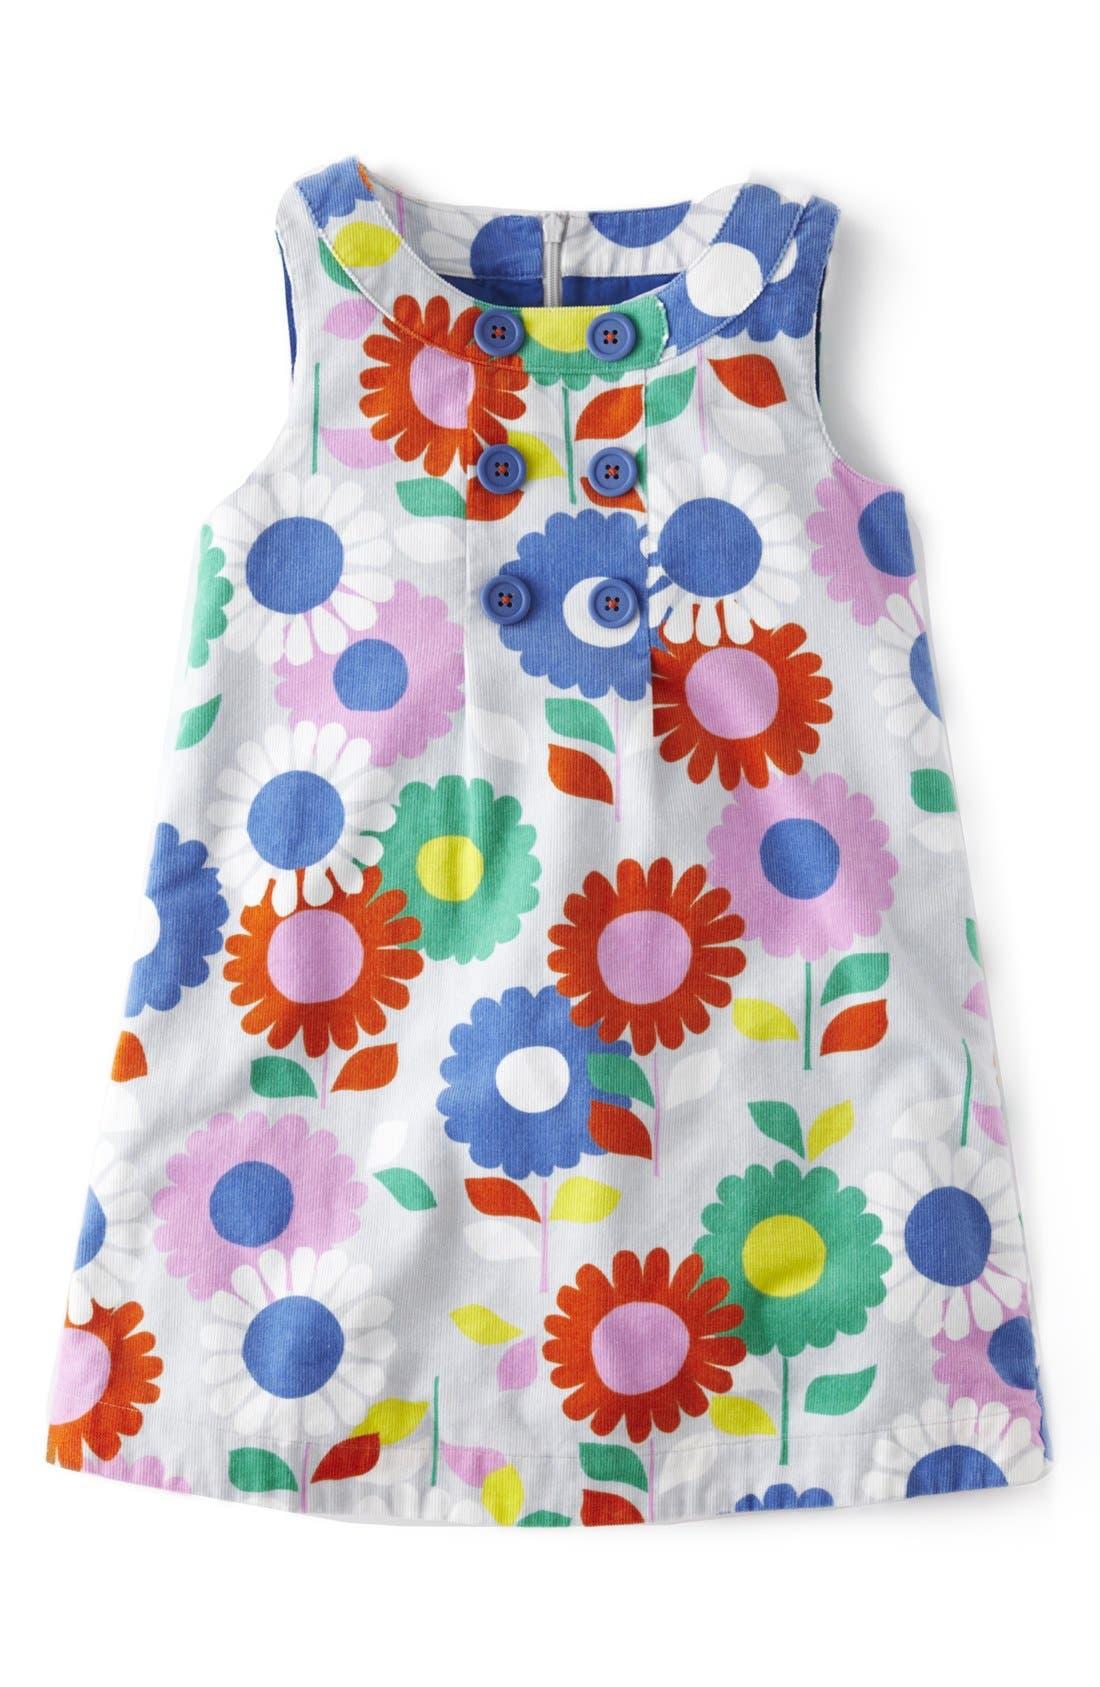 Alternate Image 1 Selected - Mini Boden Button Pinafore Dress (Toddler Girls, Little Girls & Big Girls)